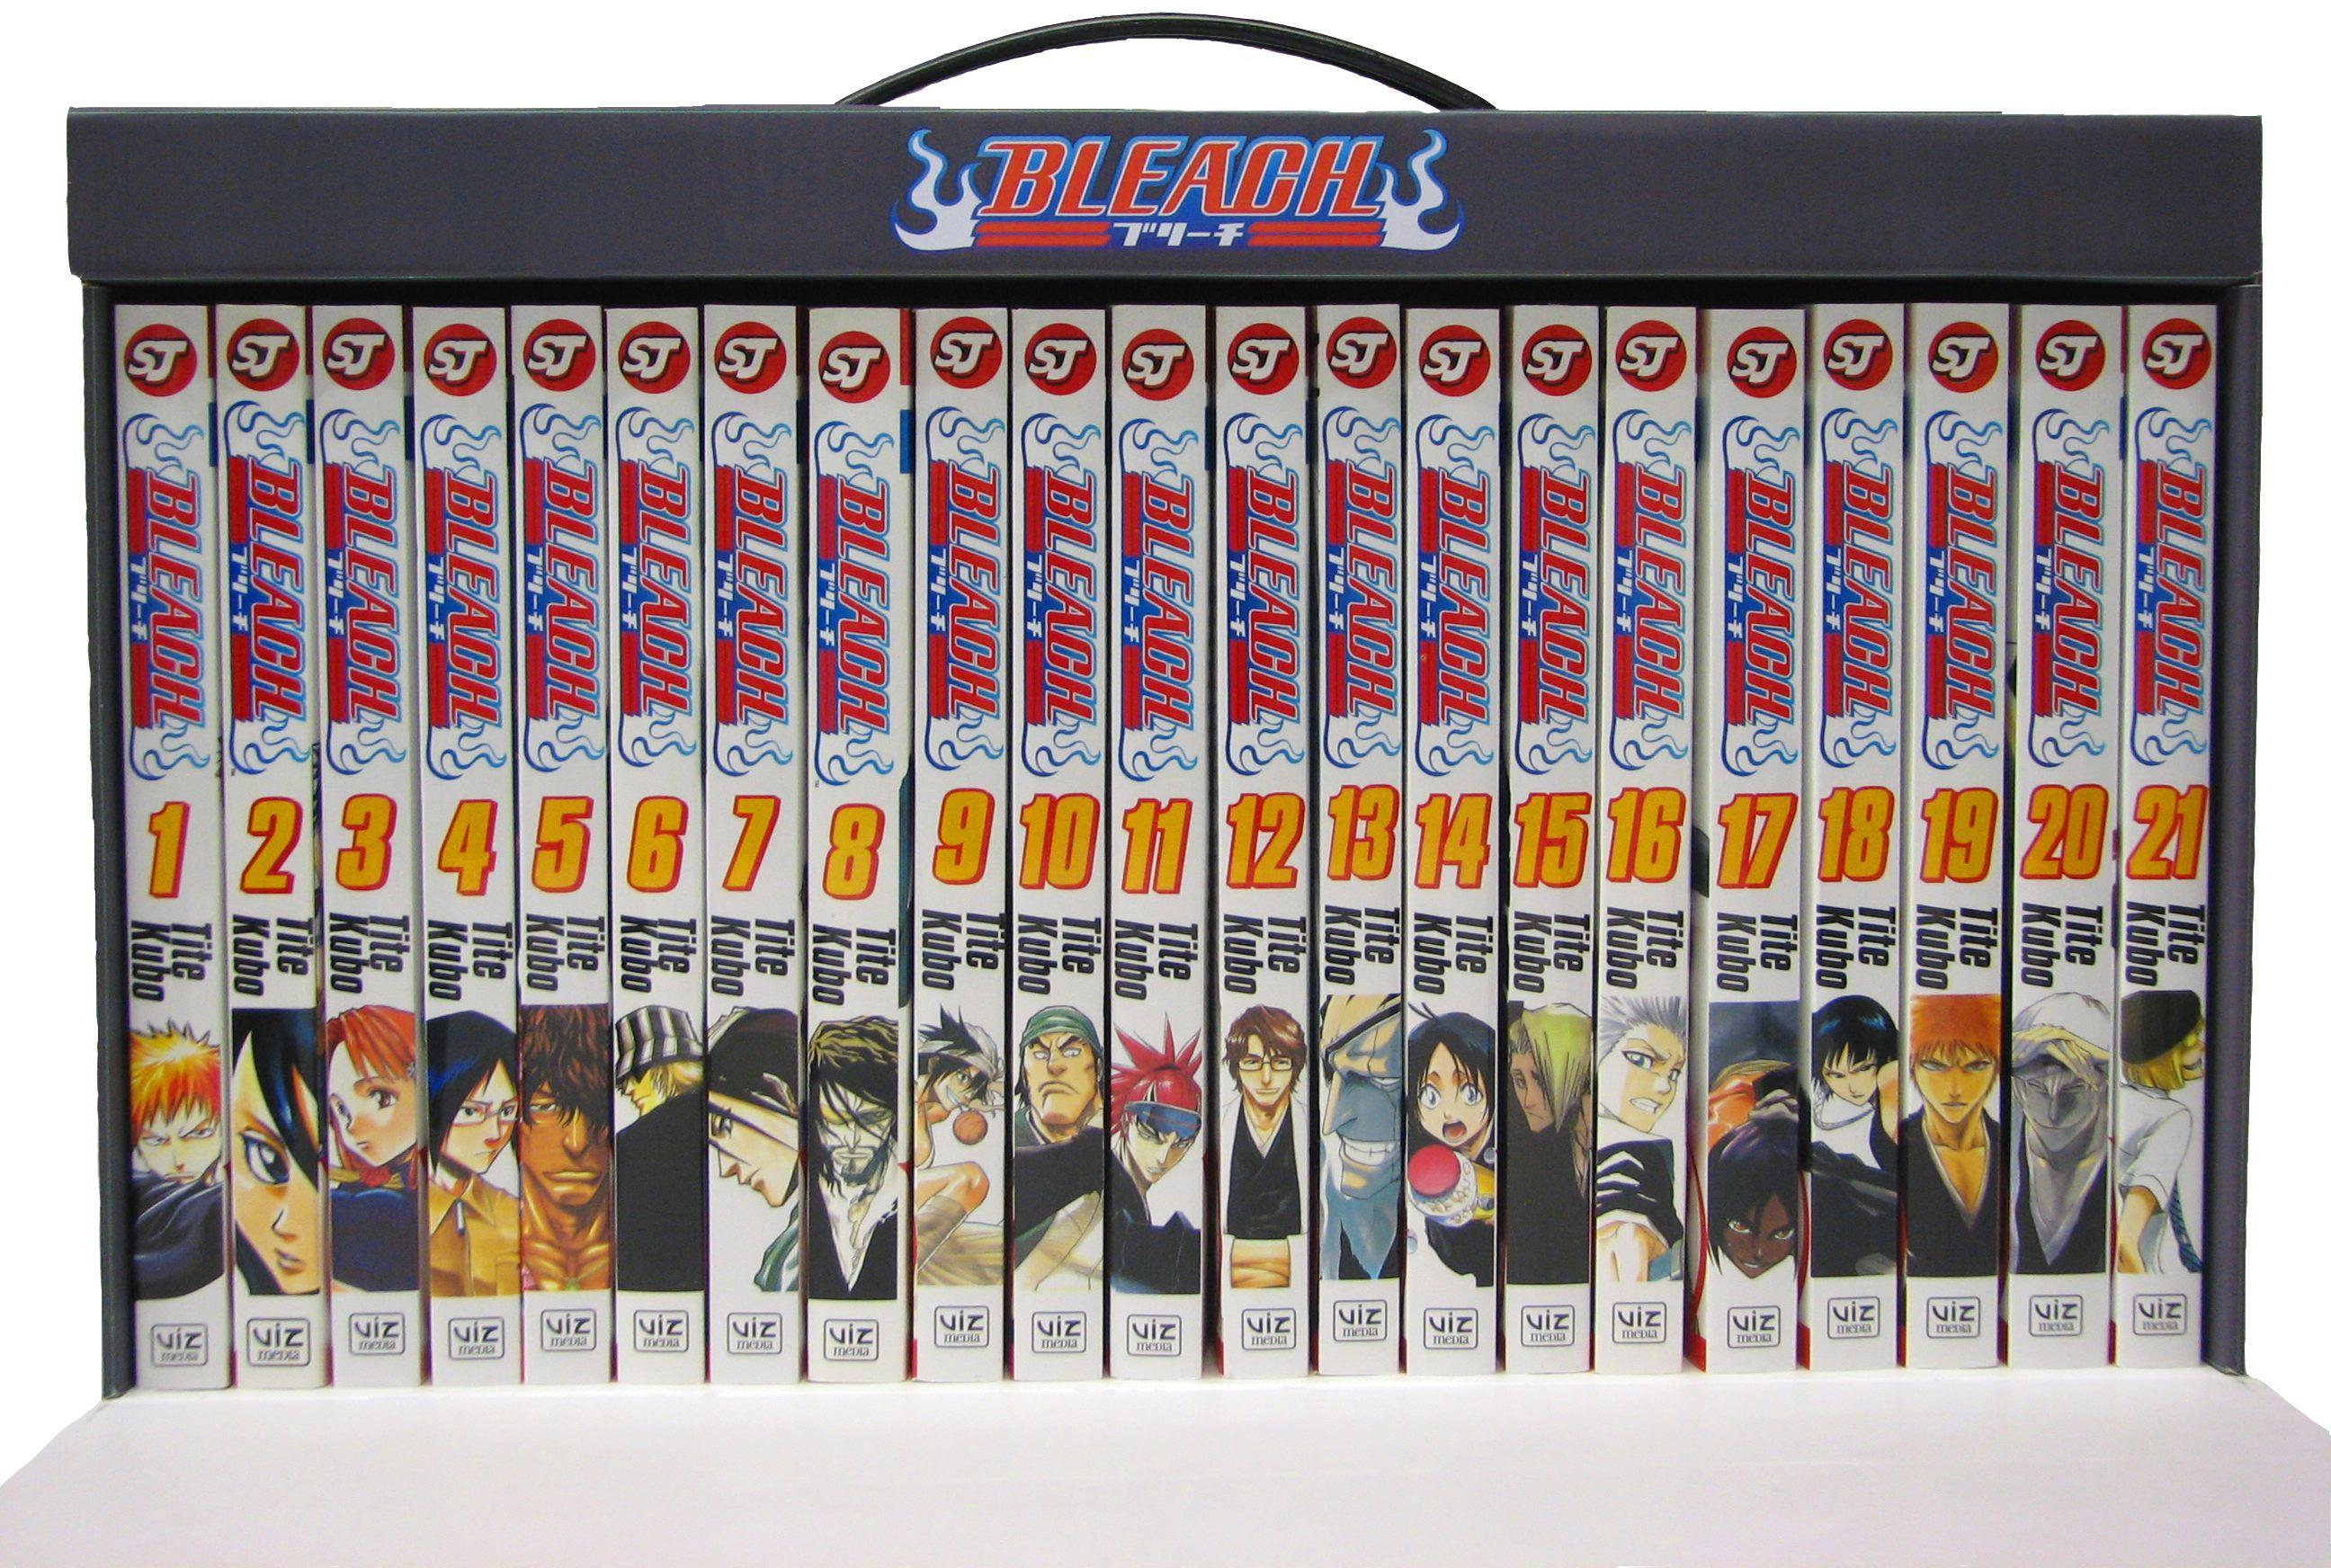 Bleach Manga Box Set - Collection 1 Volumes 1-21 @Archonia_US